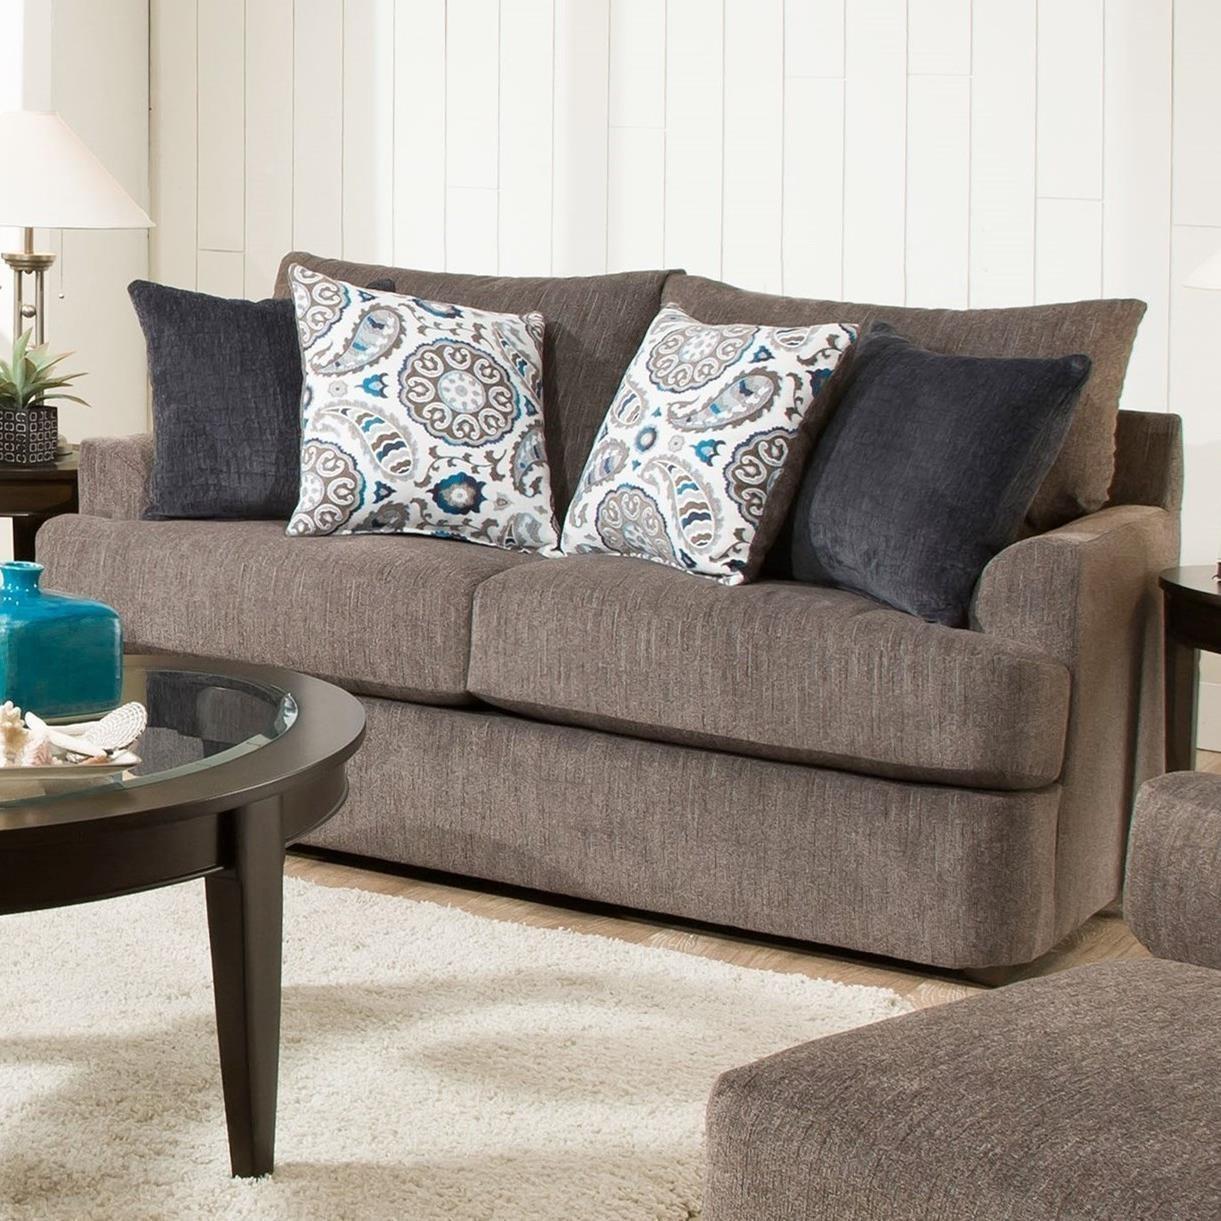 Firminus Loveseat by Acme Furniture at Nassau Furniture and Mattress